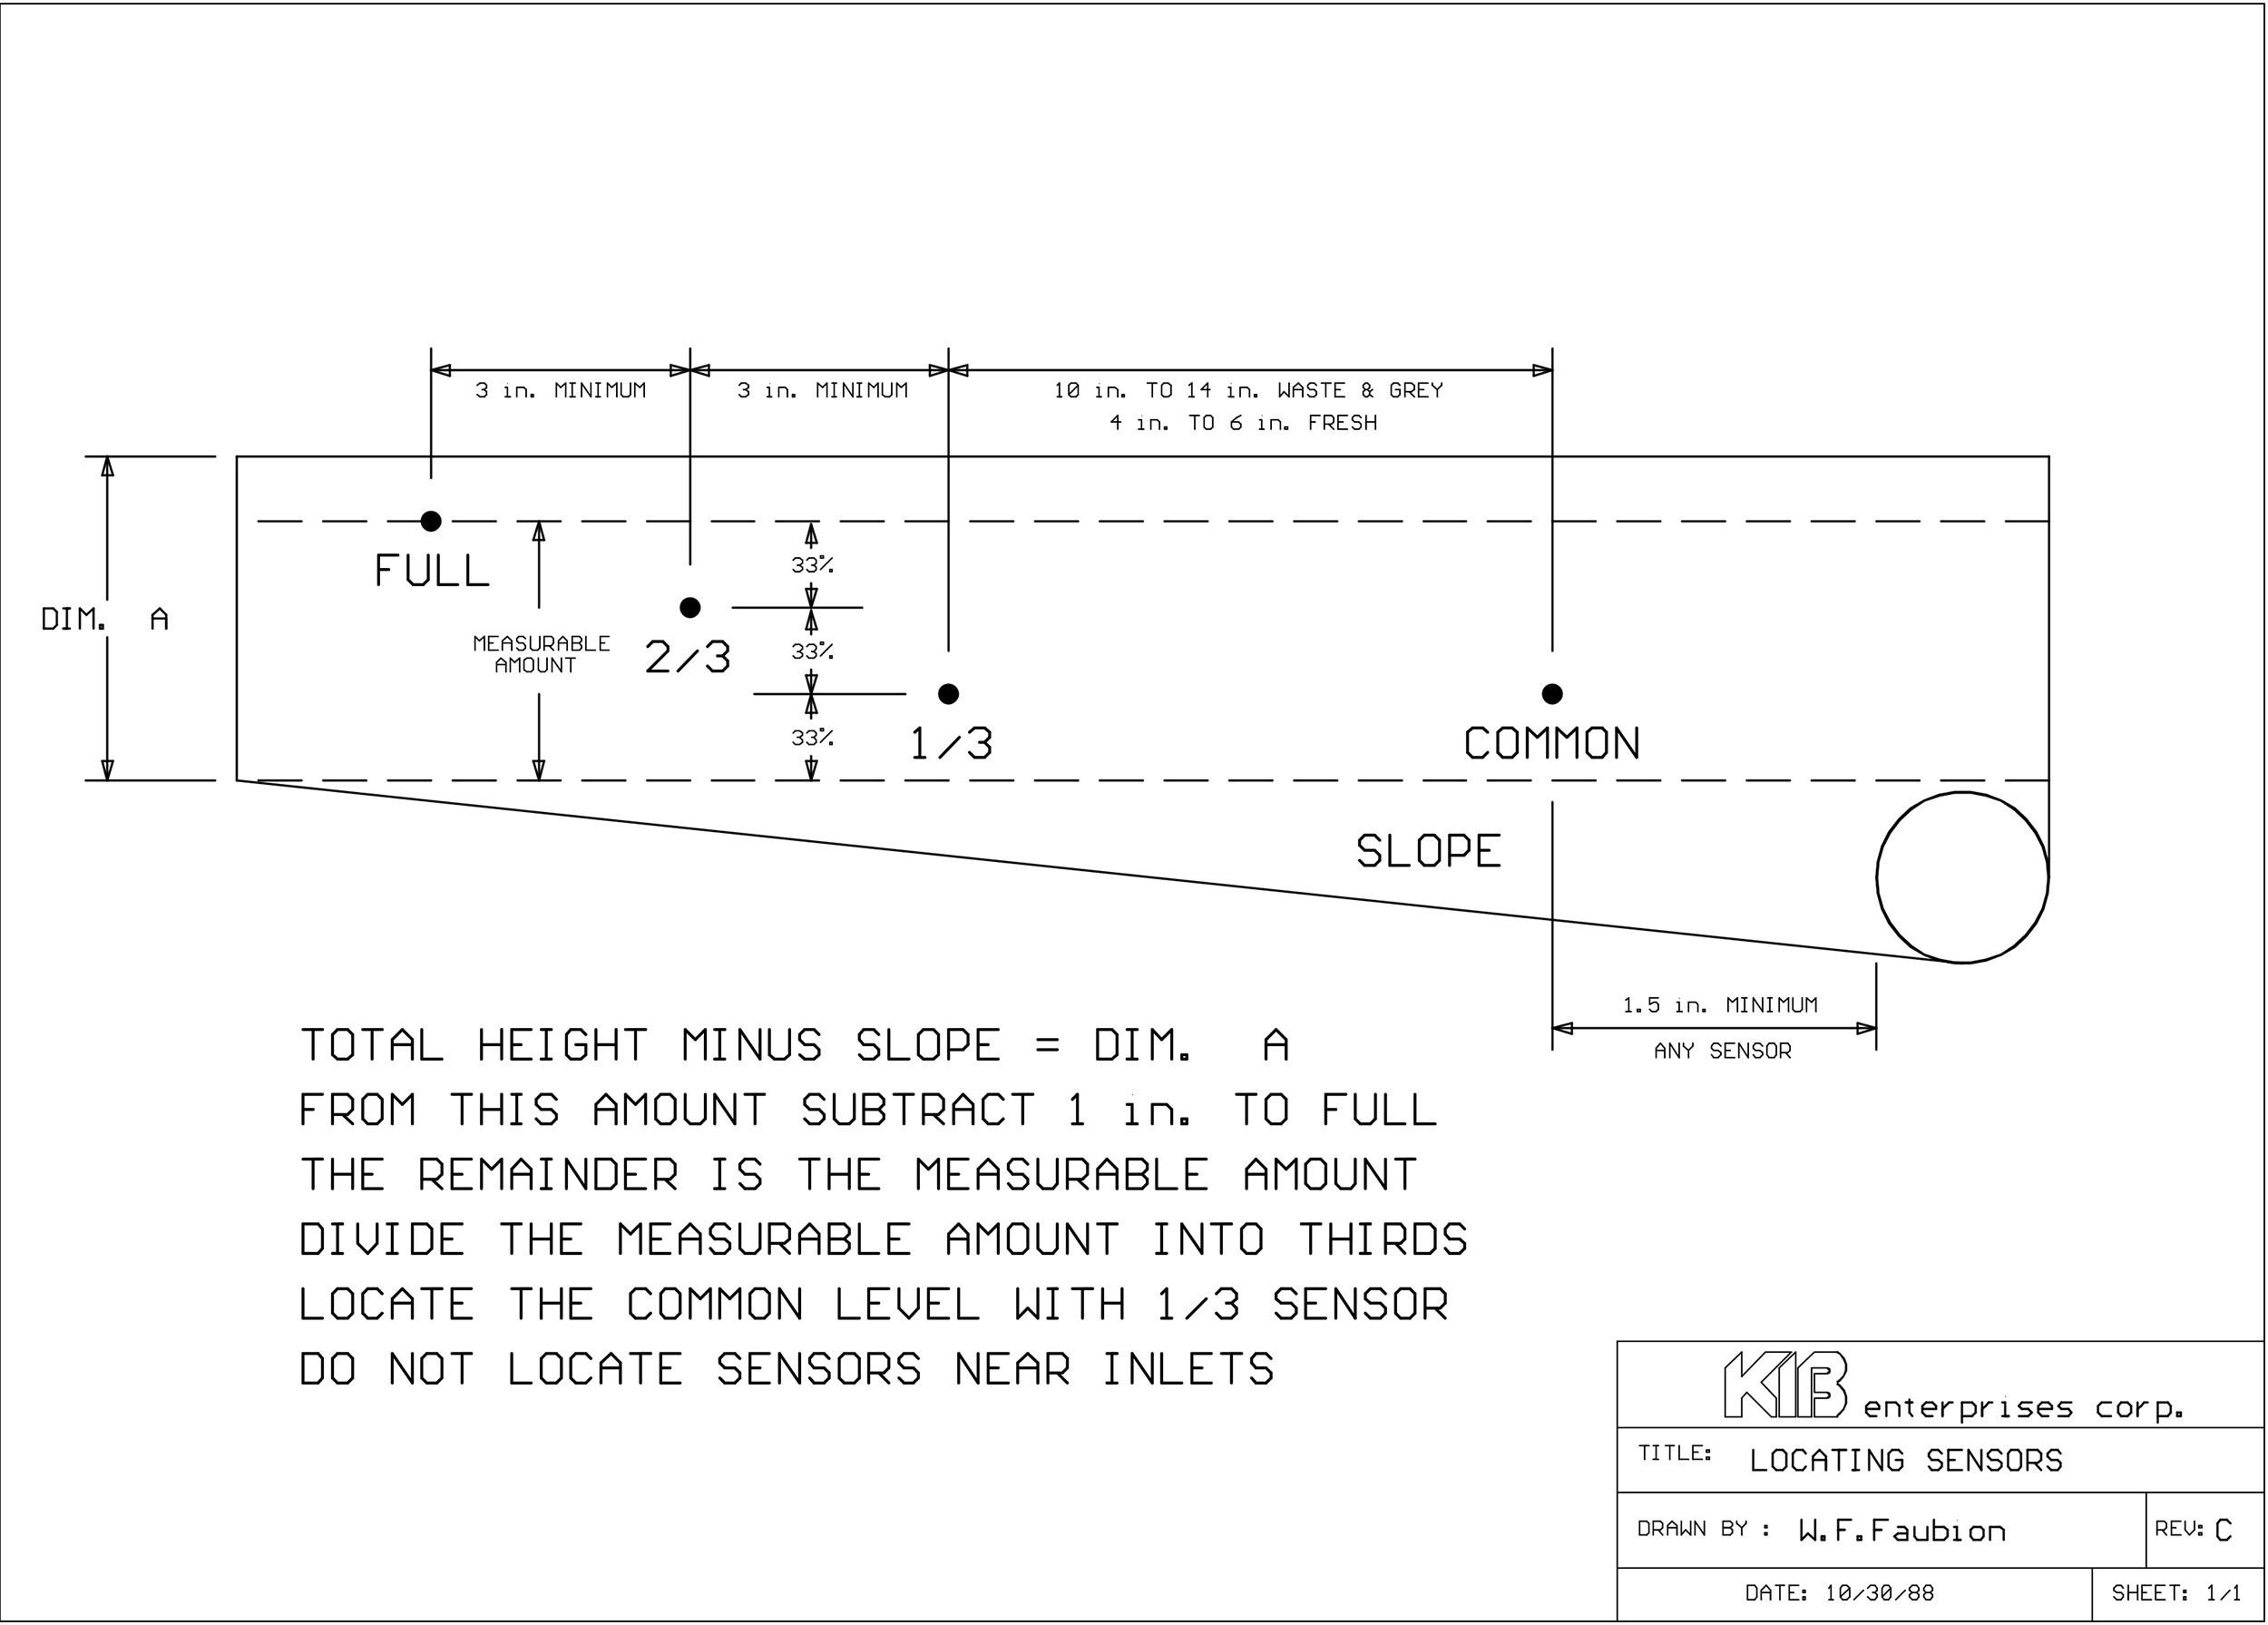 Kib Monitor Panel Manual Vz 6646] Rv Holding Tank Sensor Wiring Free Diagram Of Kib Monitor Panel Manual